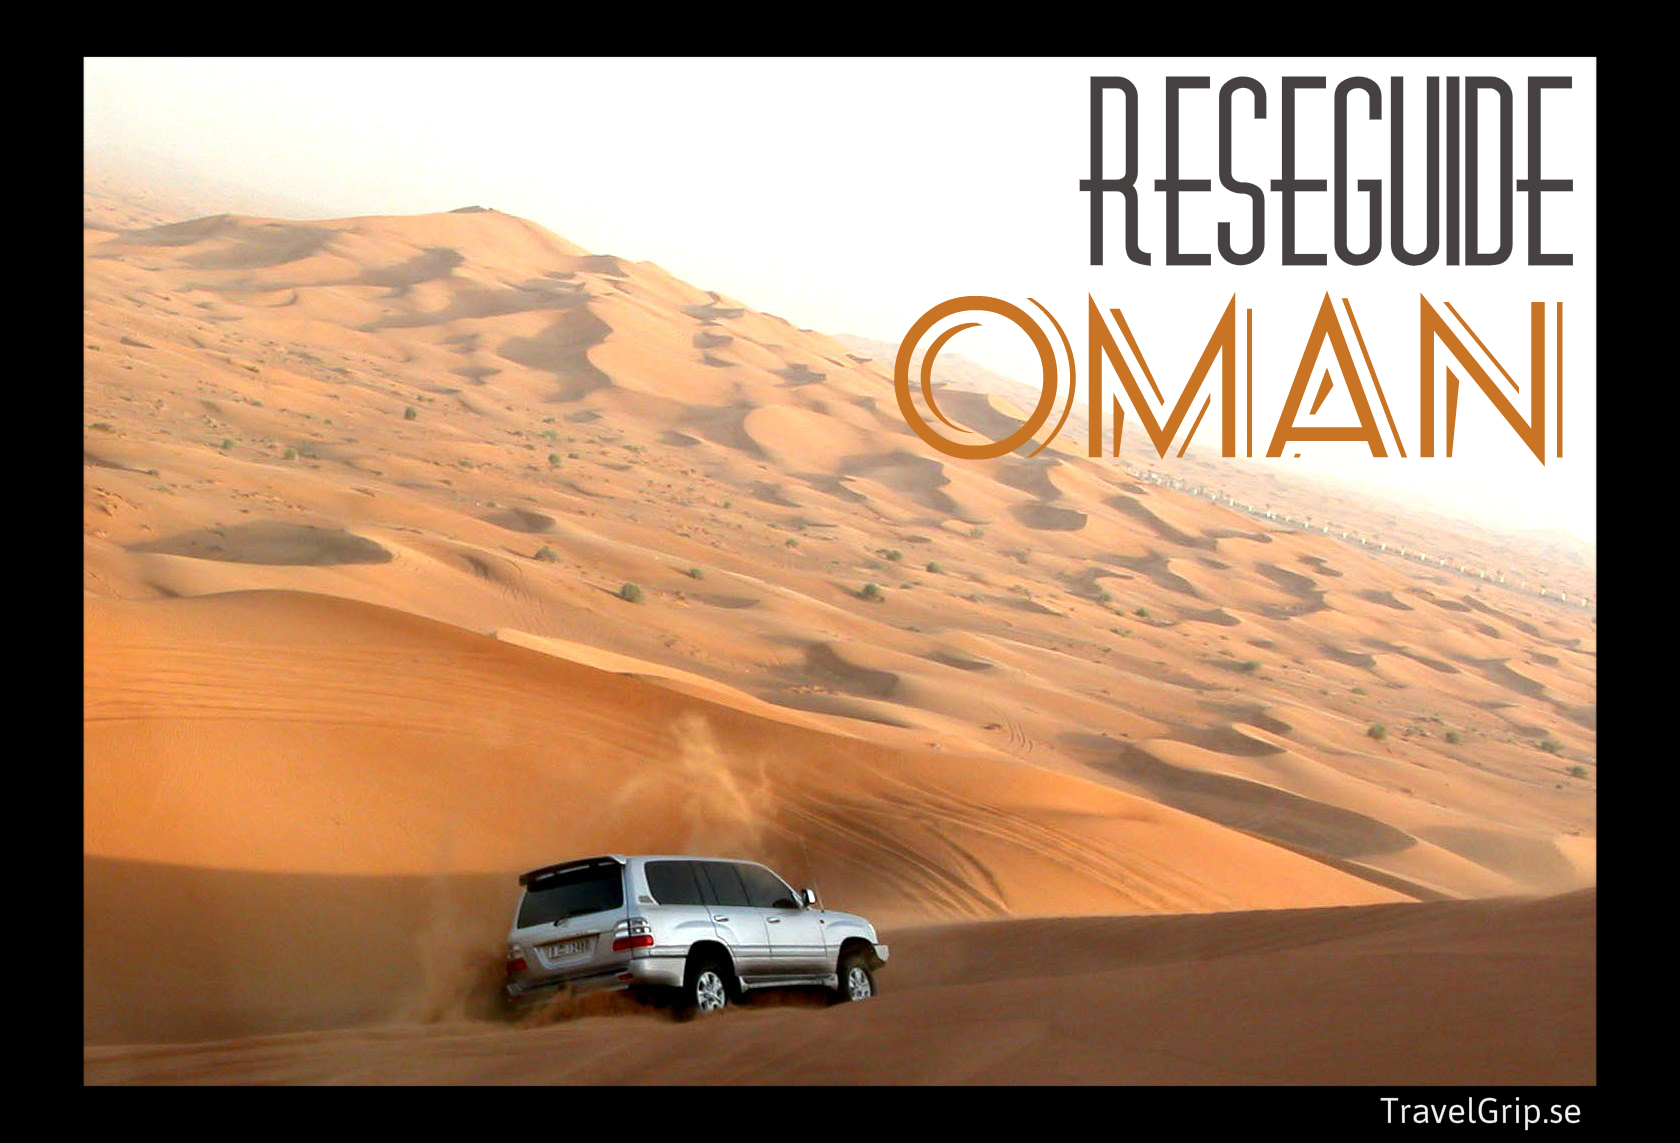 reseguide-oman-travelgrip